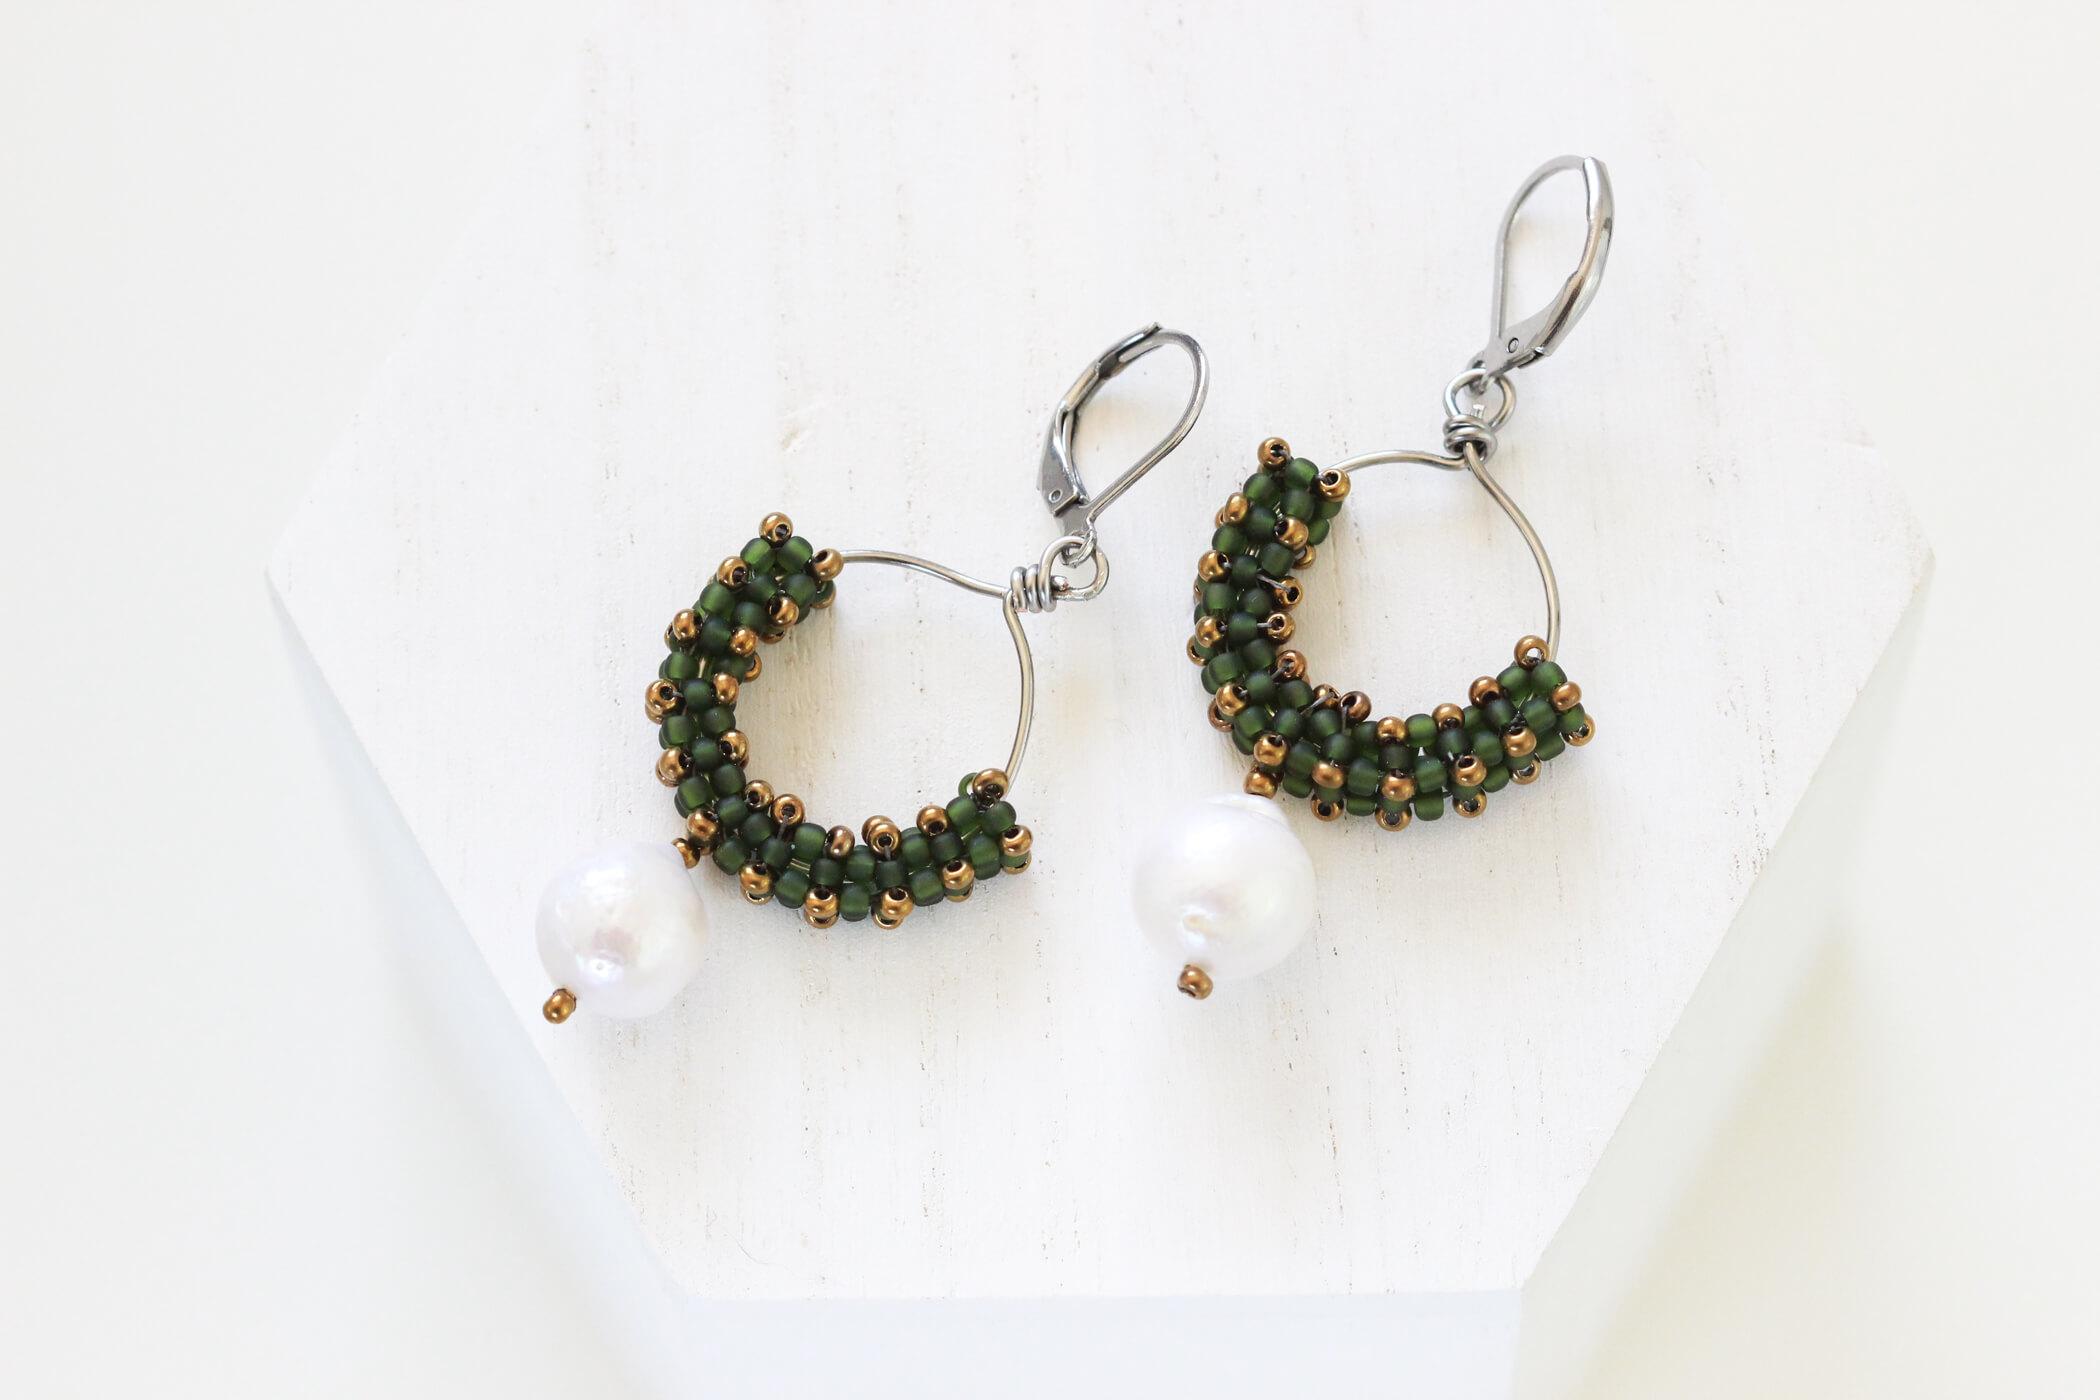 Green Hoop Earrings – Baroque Pearl Earrings by Kaleidoscopes And Polka Dots